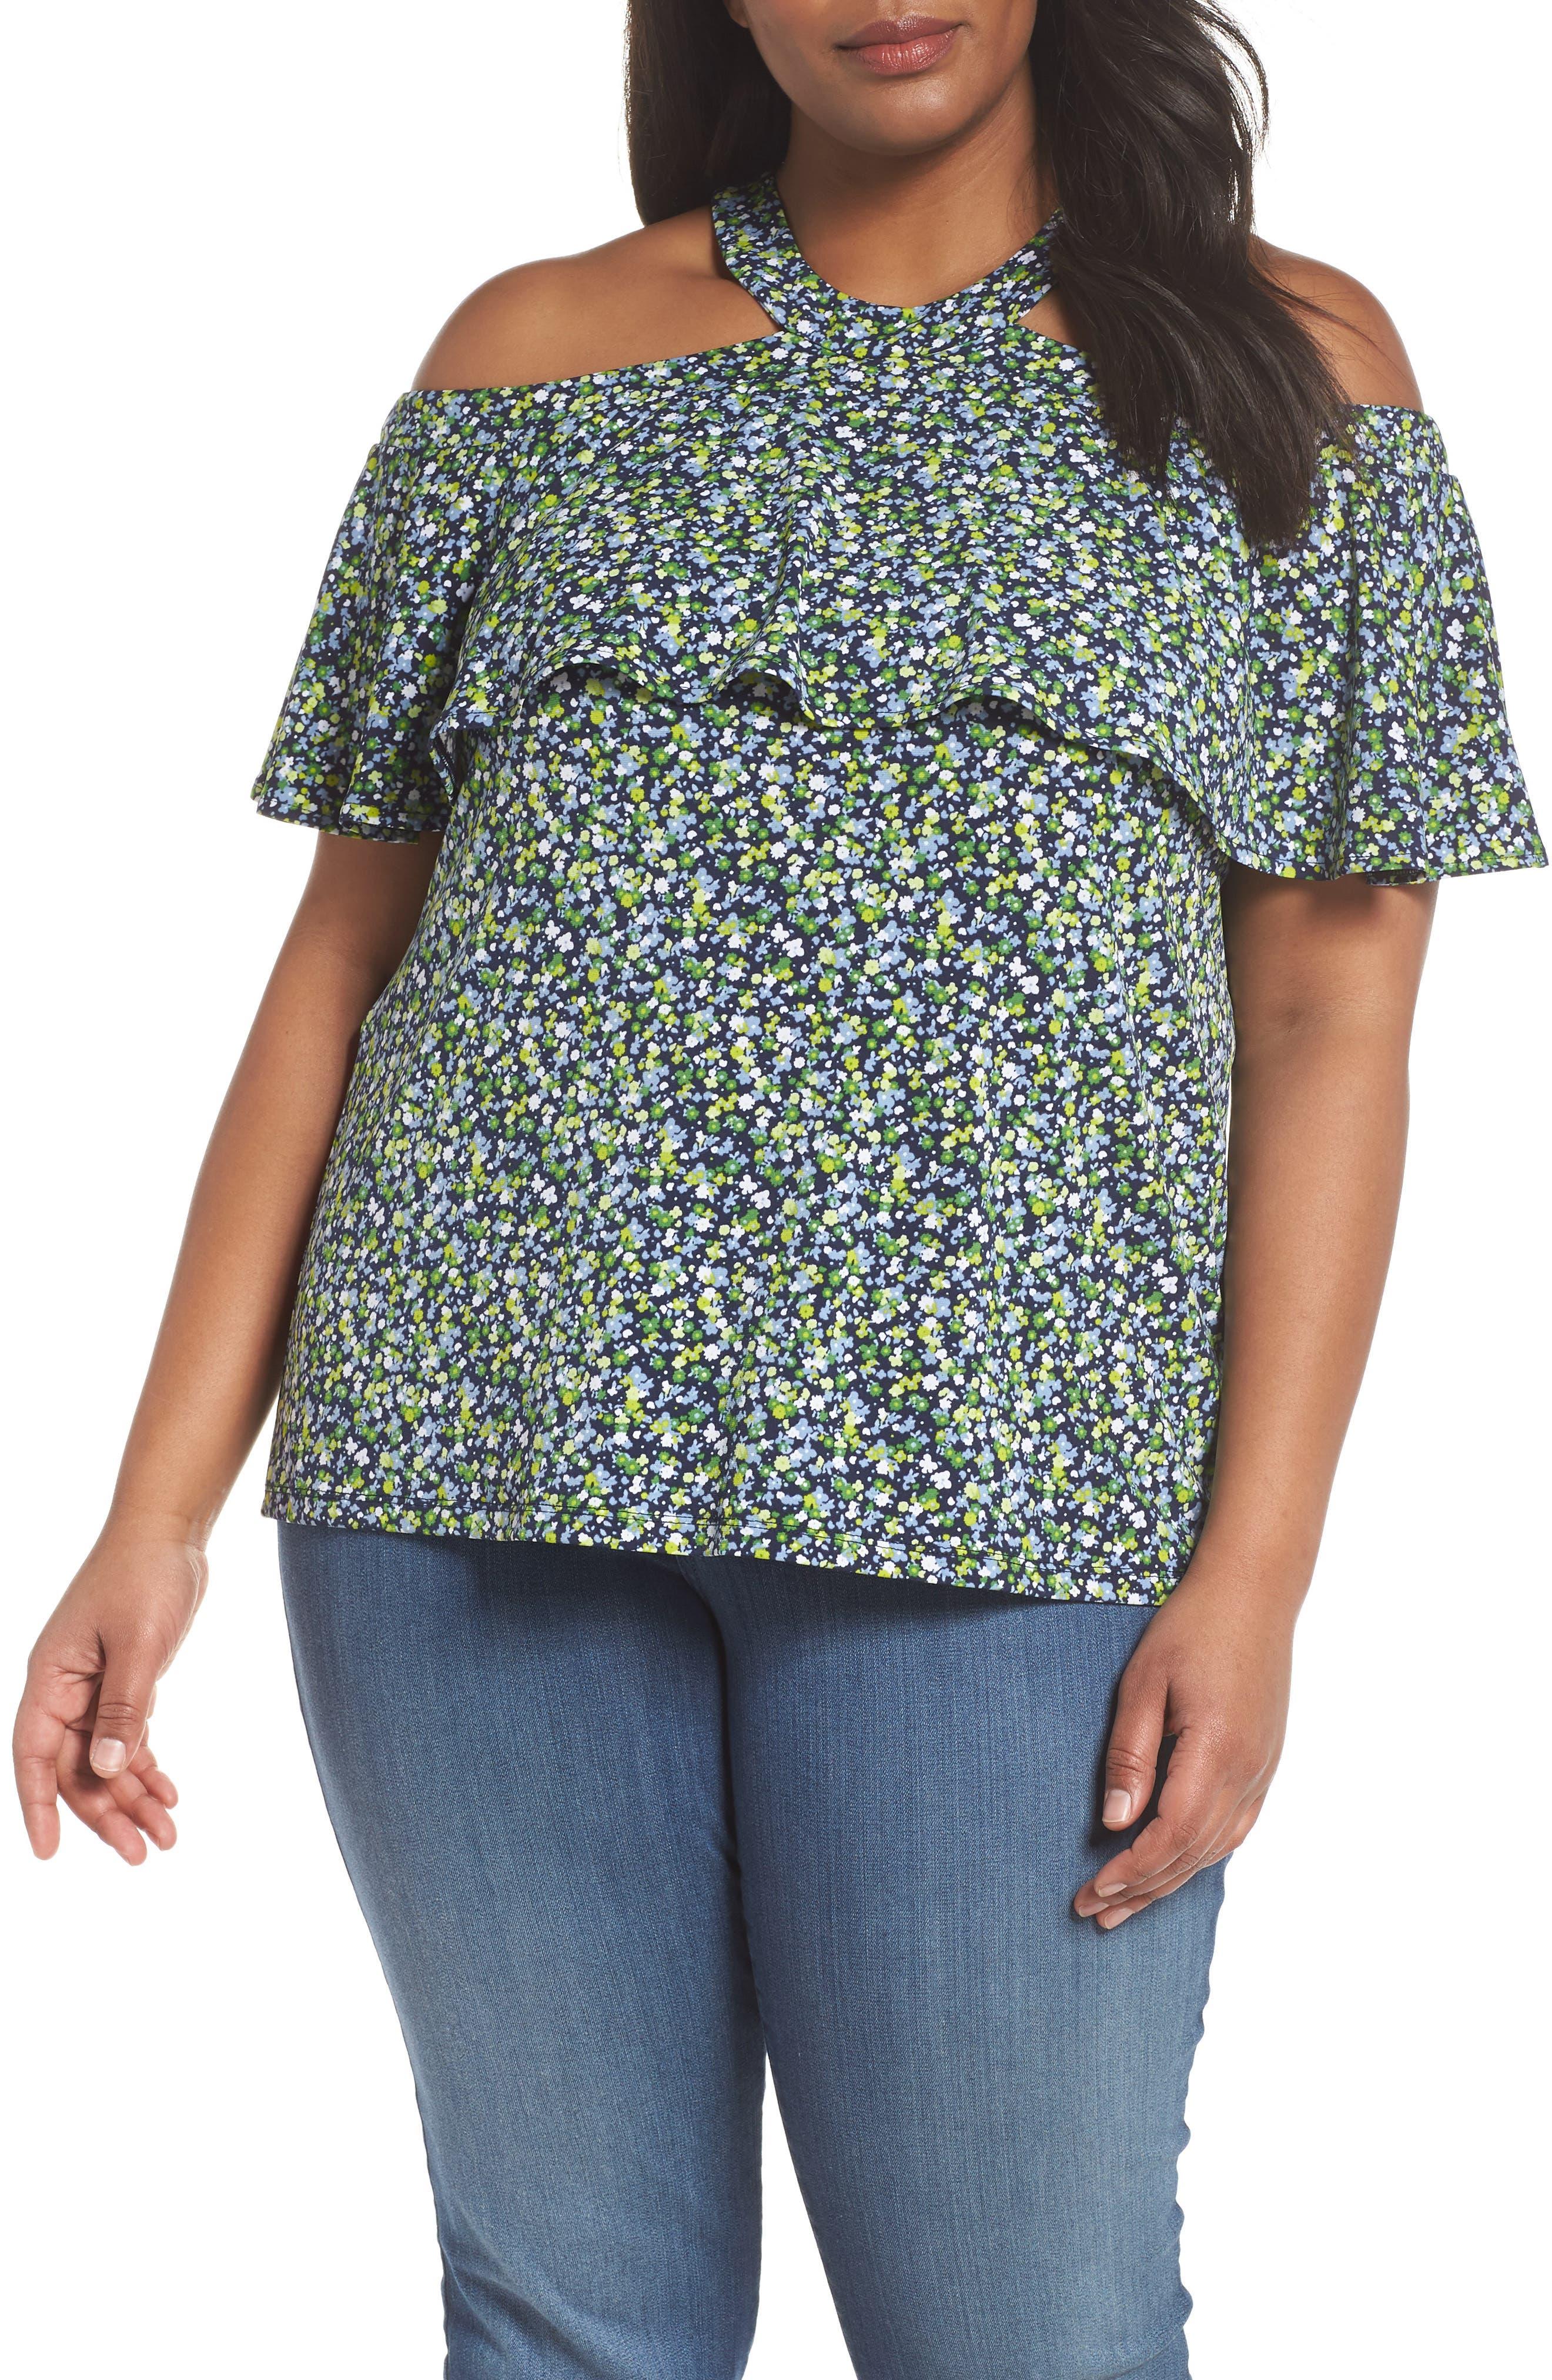 Wildflower Flounce Cold Shoulder Top,                             Main thumbnail 1, color,                             True Navy/ Green Apple Mu